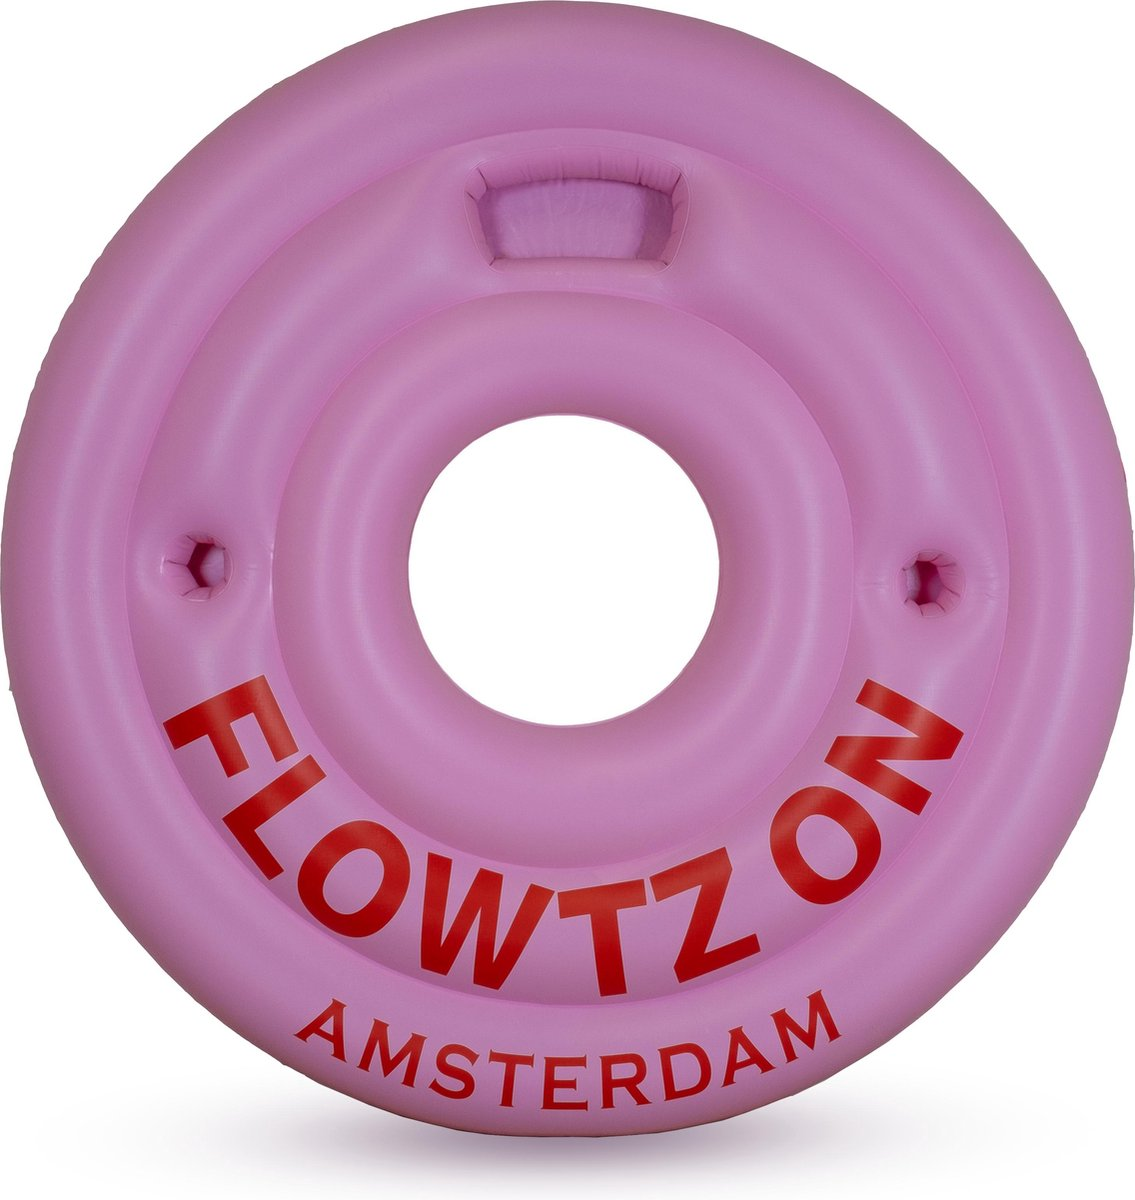 Flowtz On - Zwemband - Opblaasband - Roze - Pool float - 180 cm - Bekerhouder - Fun - Groot - Pool float - Zomer - Strand - Zwembad